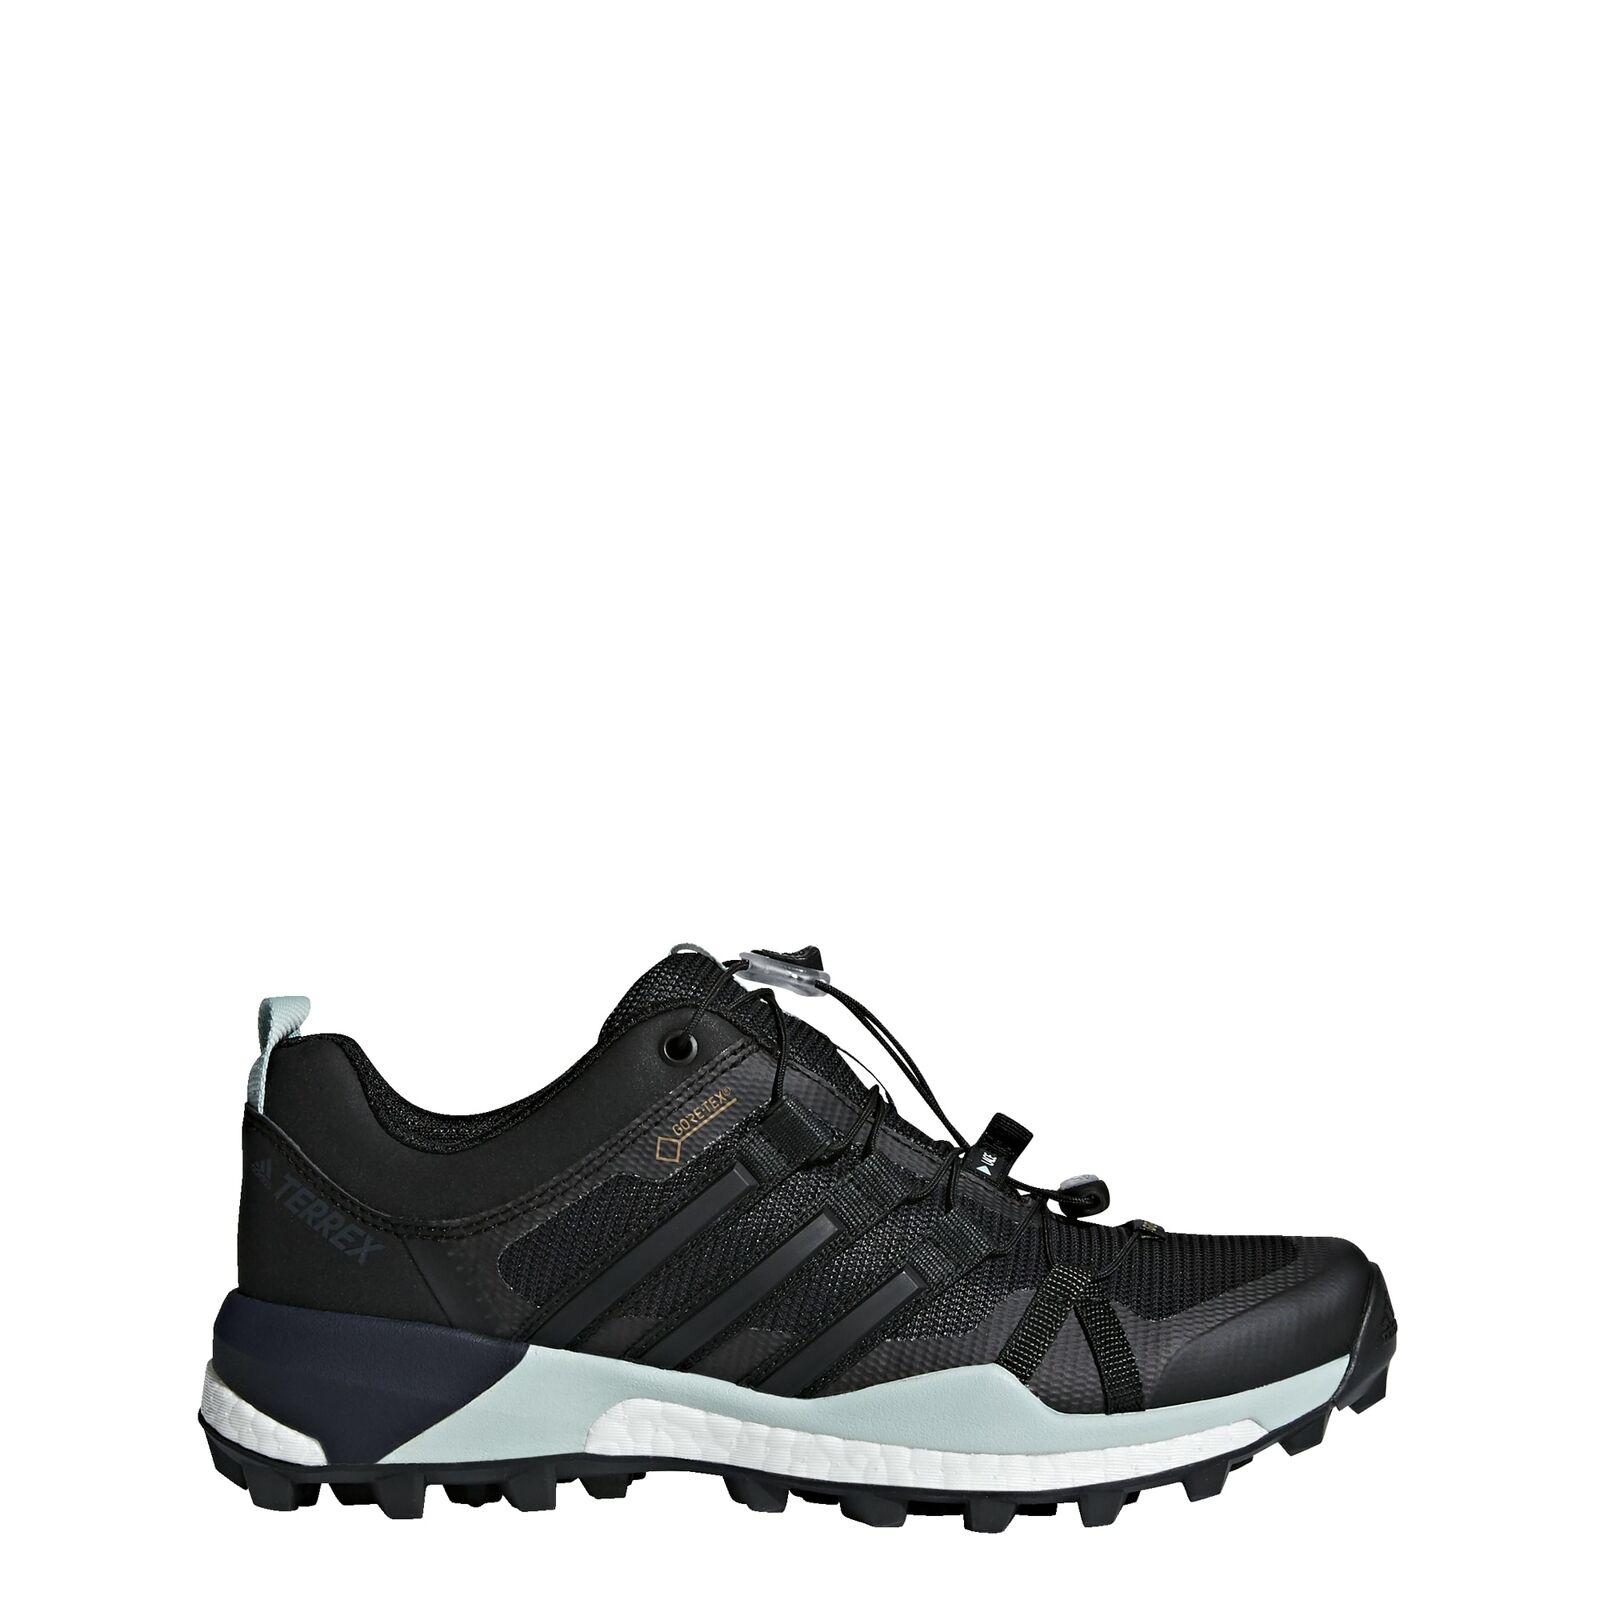 Adidas Terrex Skychaser GTX schoenen Womannen Other Sports schoenen;hardlopen schoenen zwart